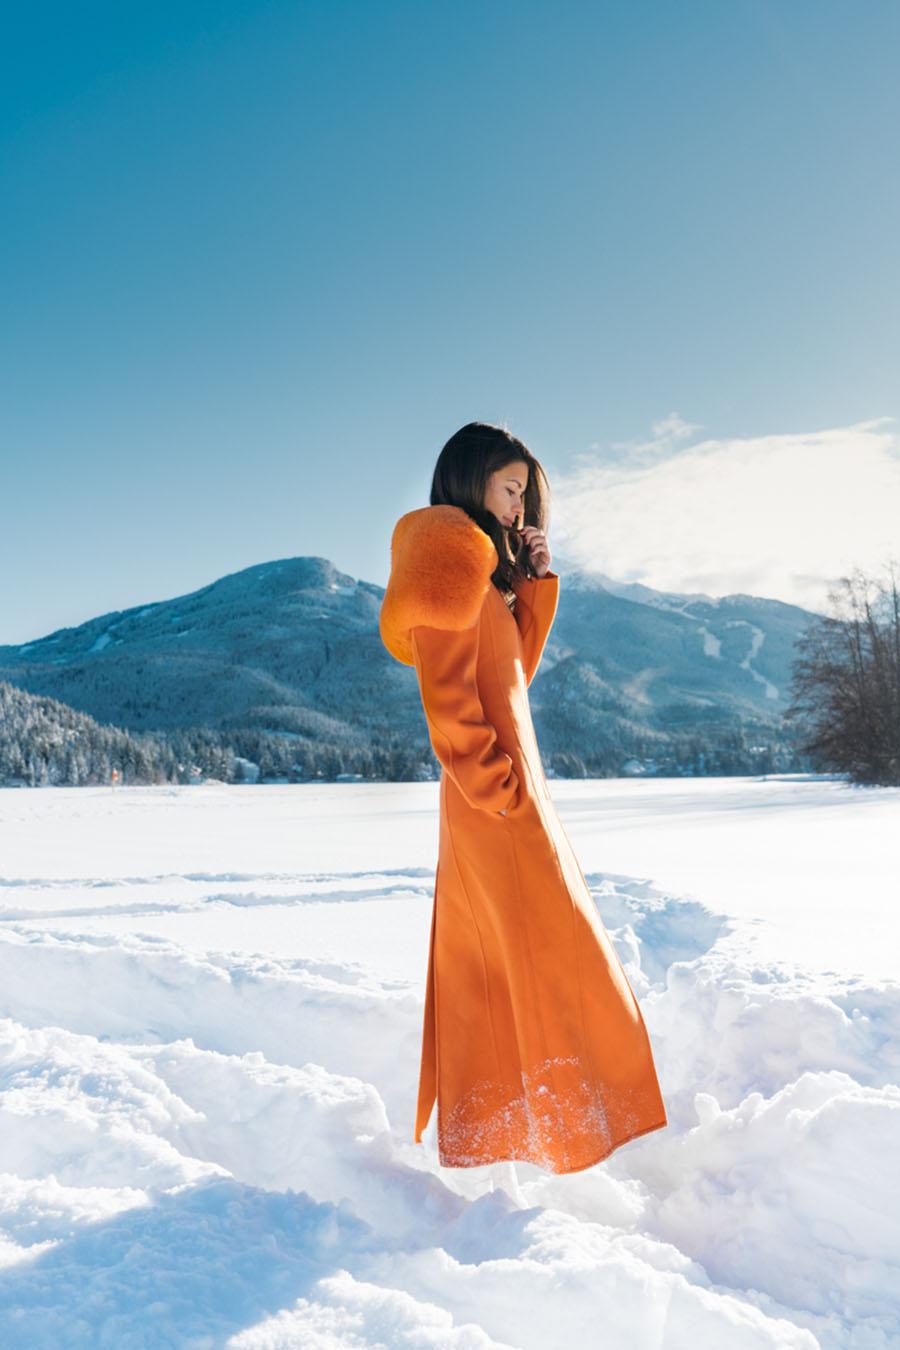 Salvatore Ferragamo Padded Wool Blend Coat in Orange Whistler Snow Outfit DSC07464-Edit.jpg